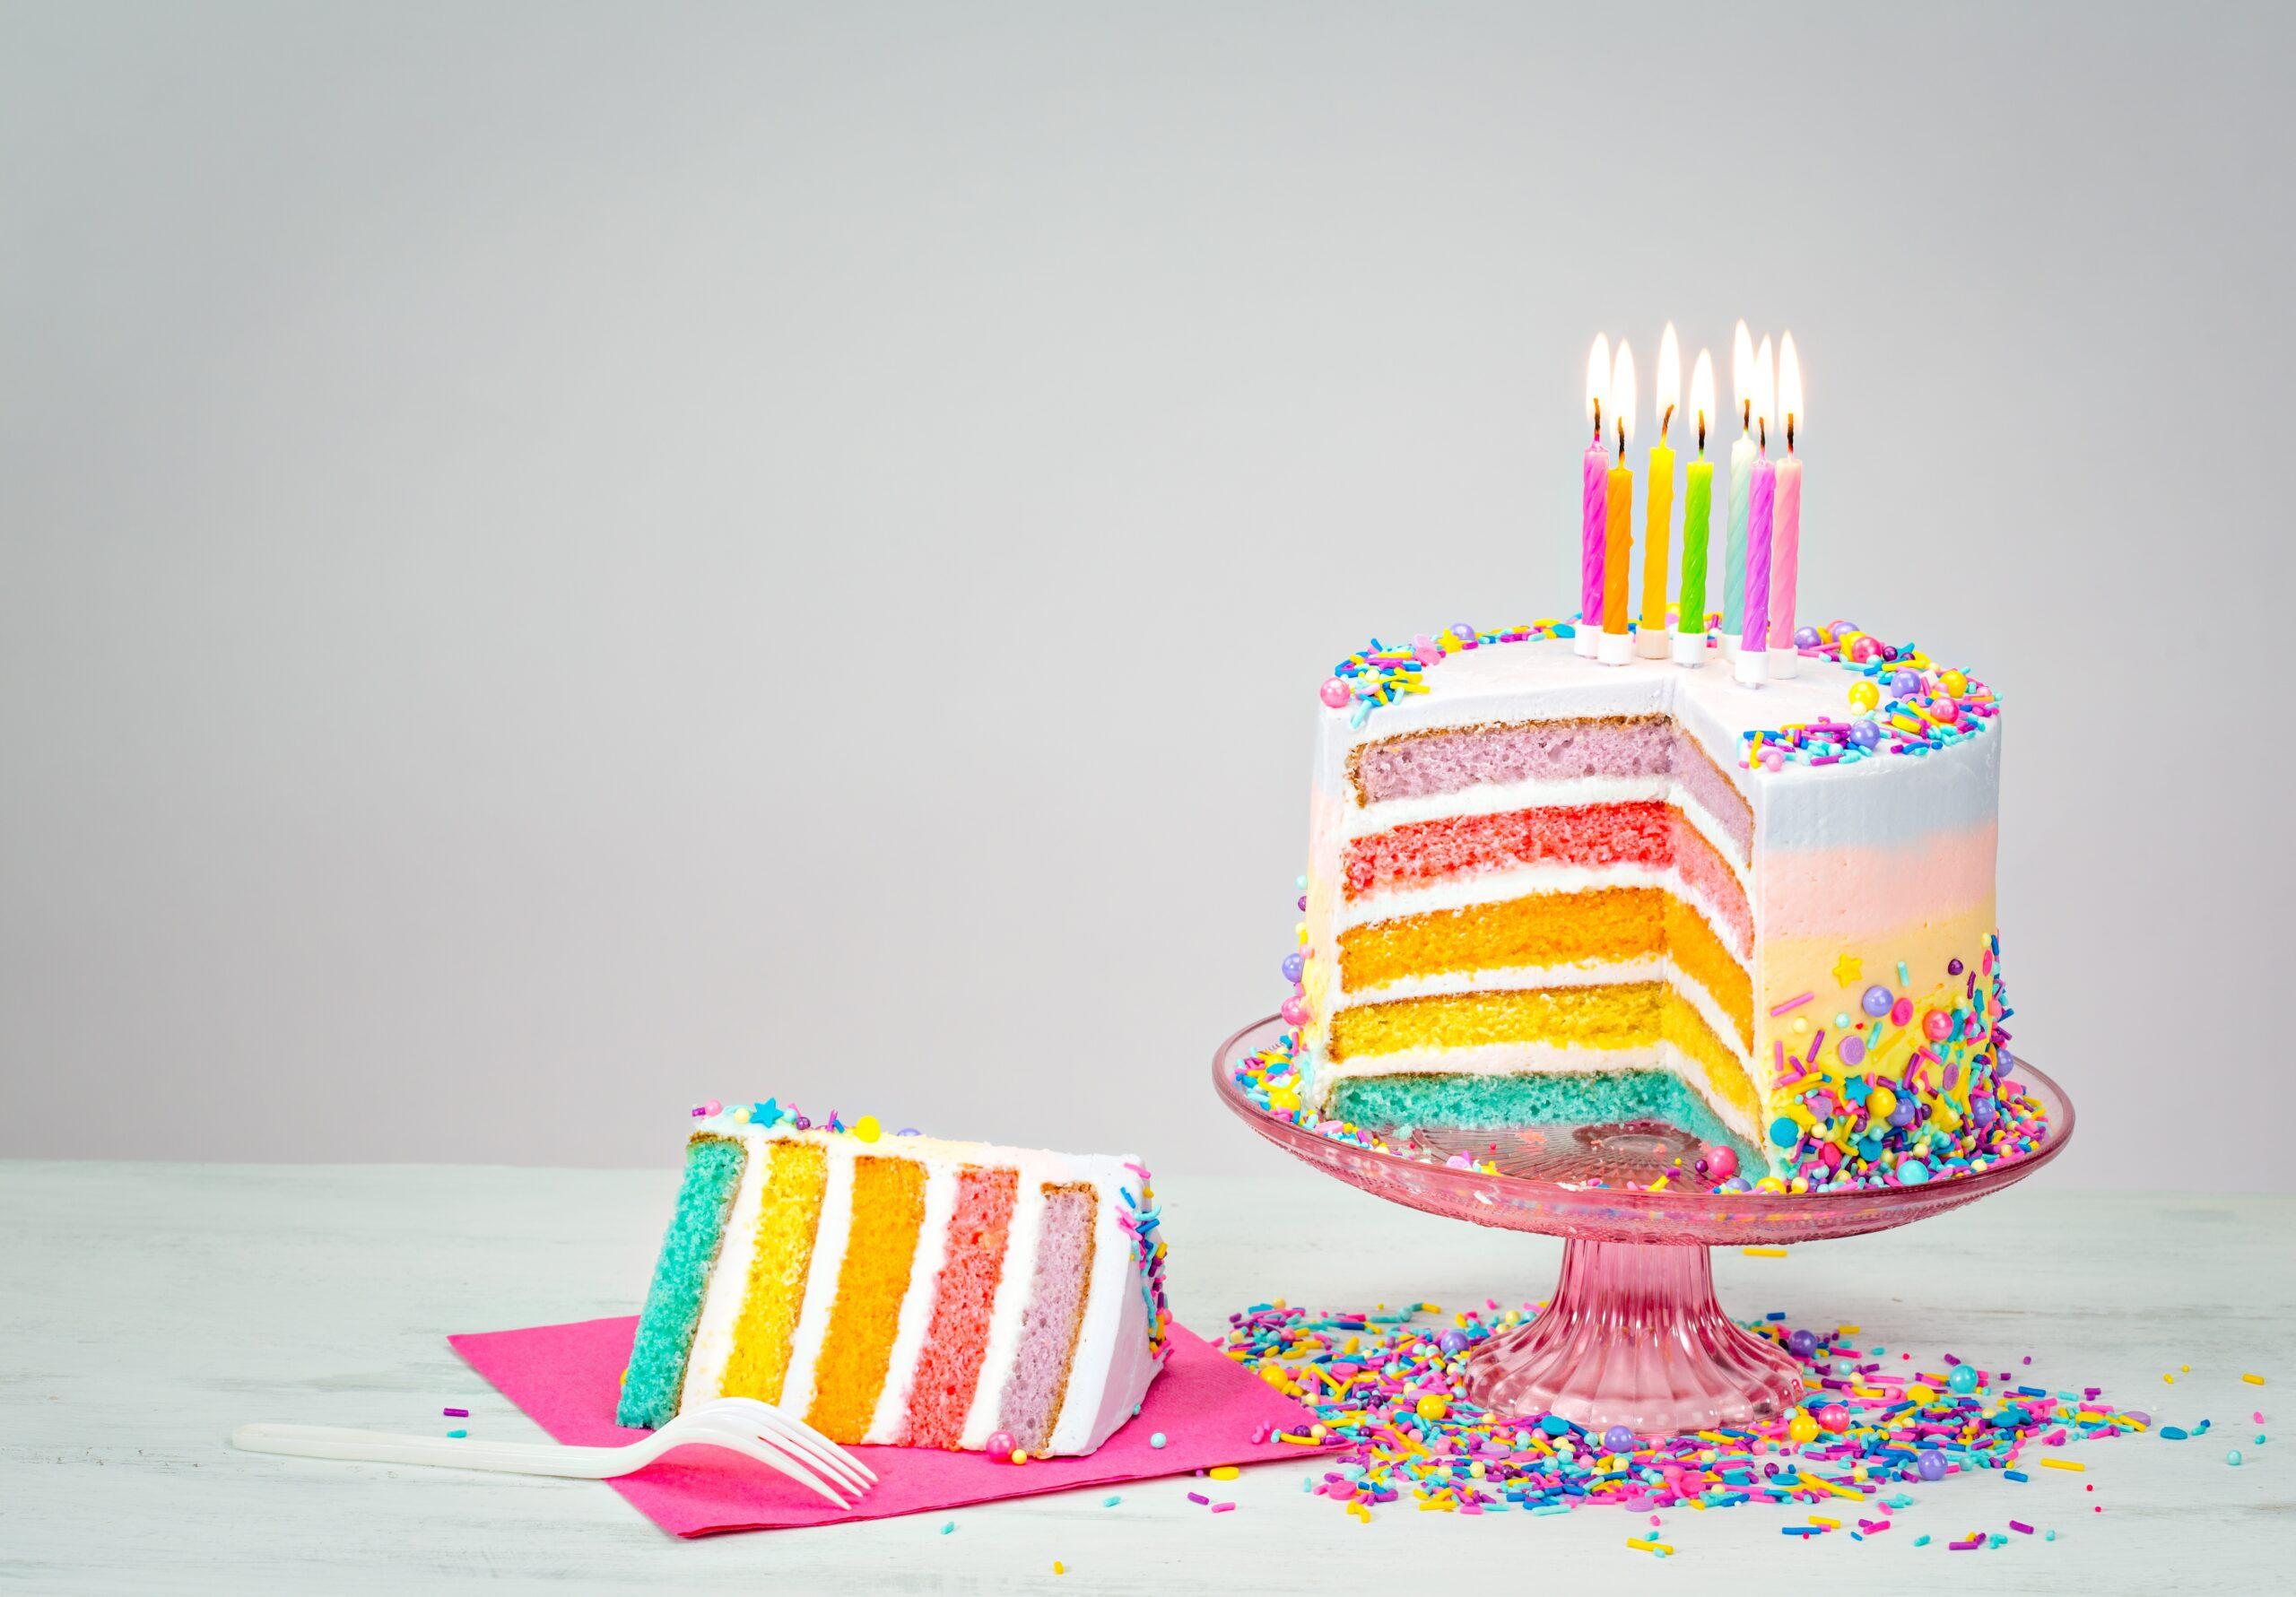 https://img4.goodfon.ru/wallpaper/original/8/70/den-rozhdeniia-colorful-tort-cake-happy-birthday-celebration.jpg